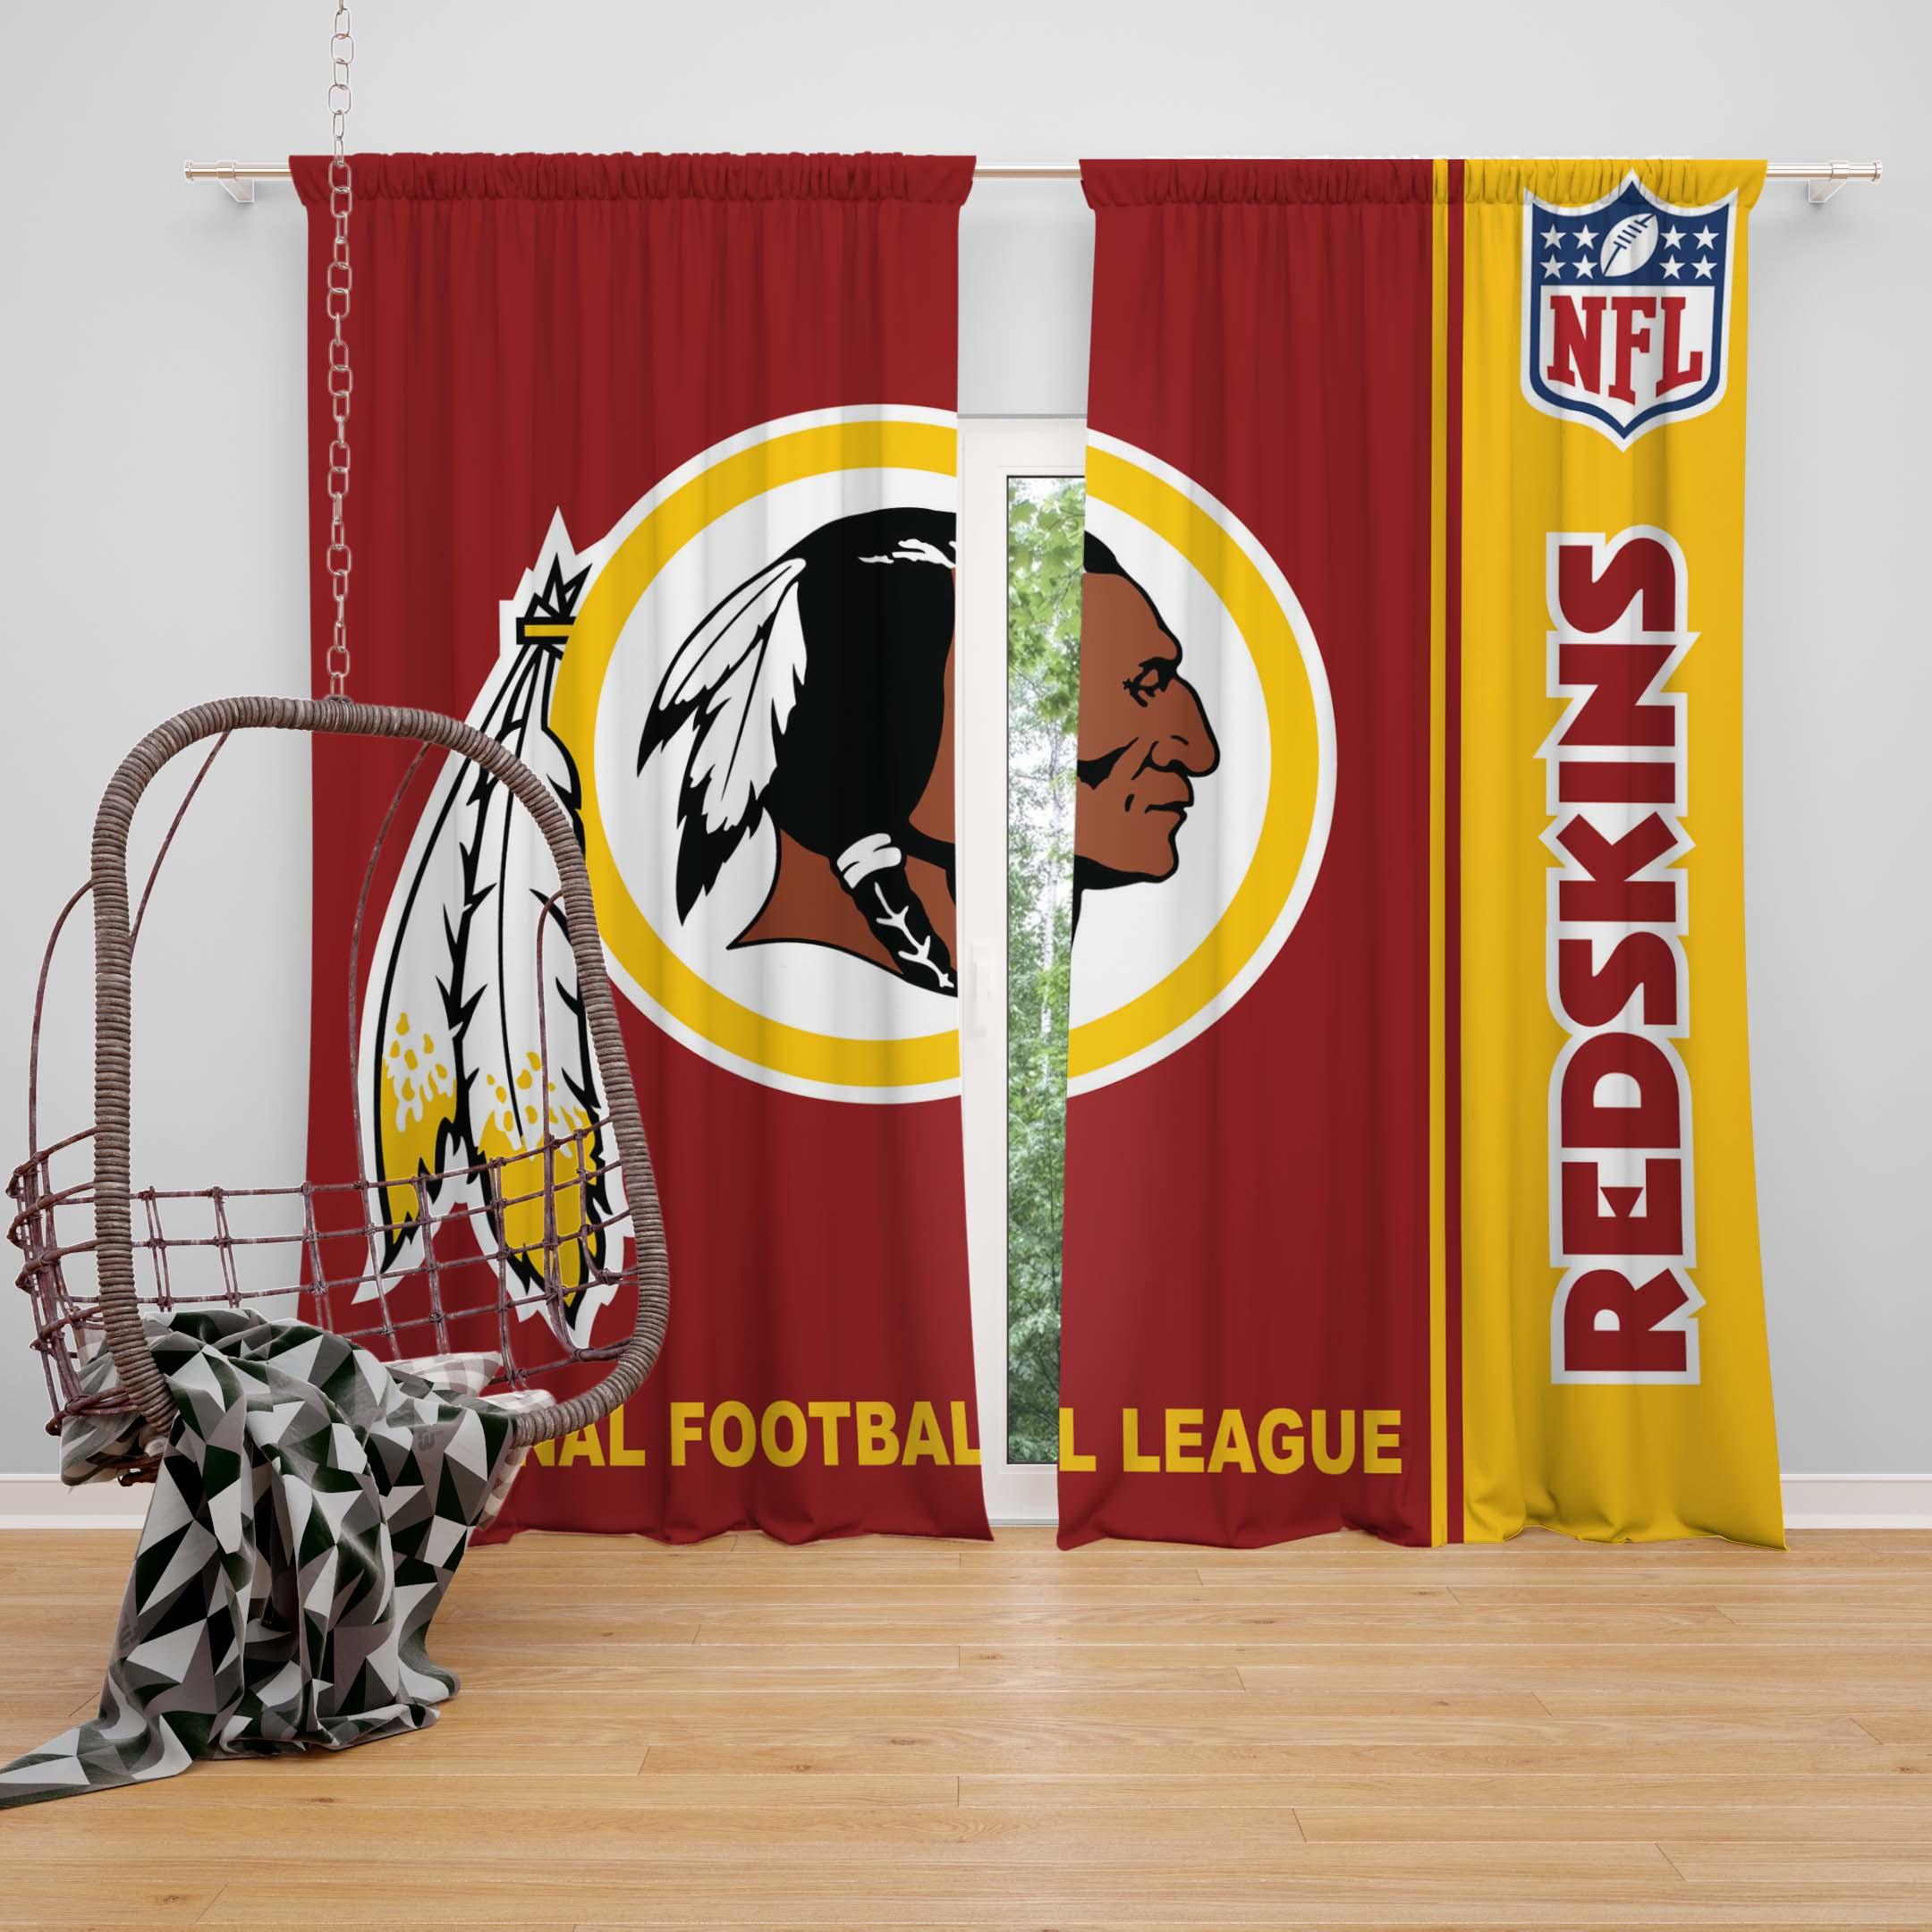 Nfl Washington Redskins Bedroom Curtain Ebeddingsets